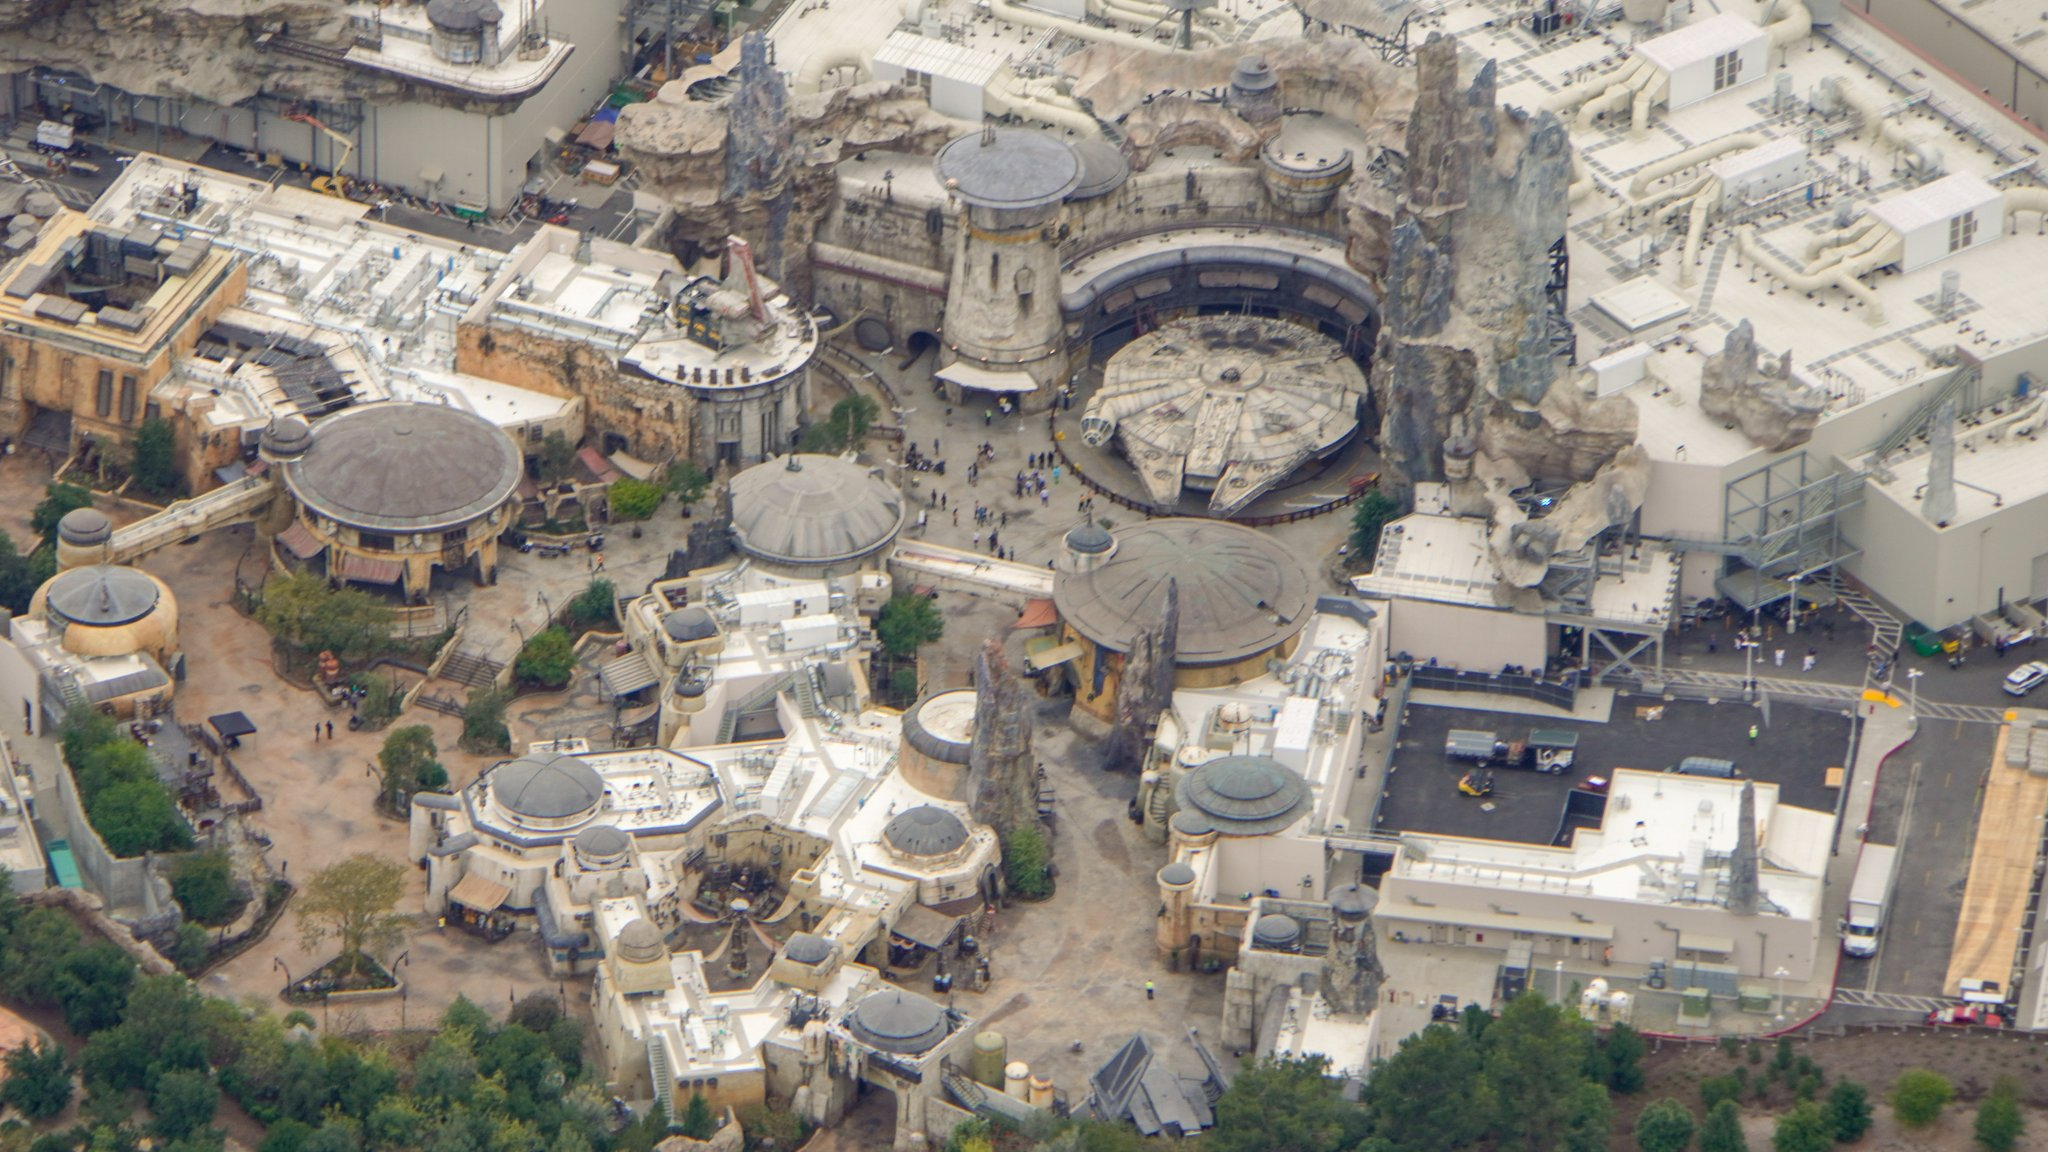 Bioreconstruct On Twitter Aerial View Of Star Wars Galaxy S Edge Disneyland 24 Days Until Opening